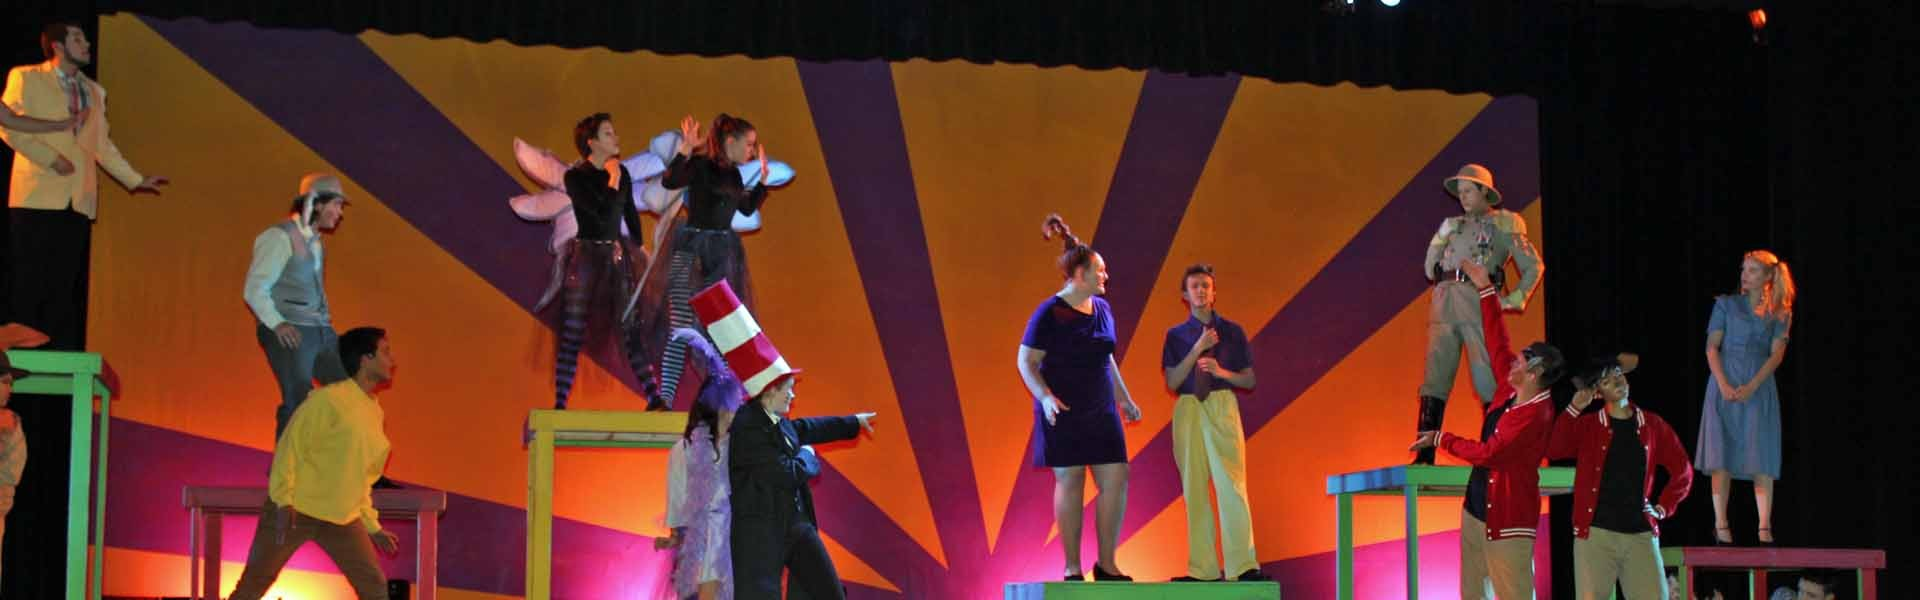 Sierravista-Highschool-AZ-Play-Main-Banner-US-2019